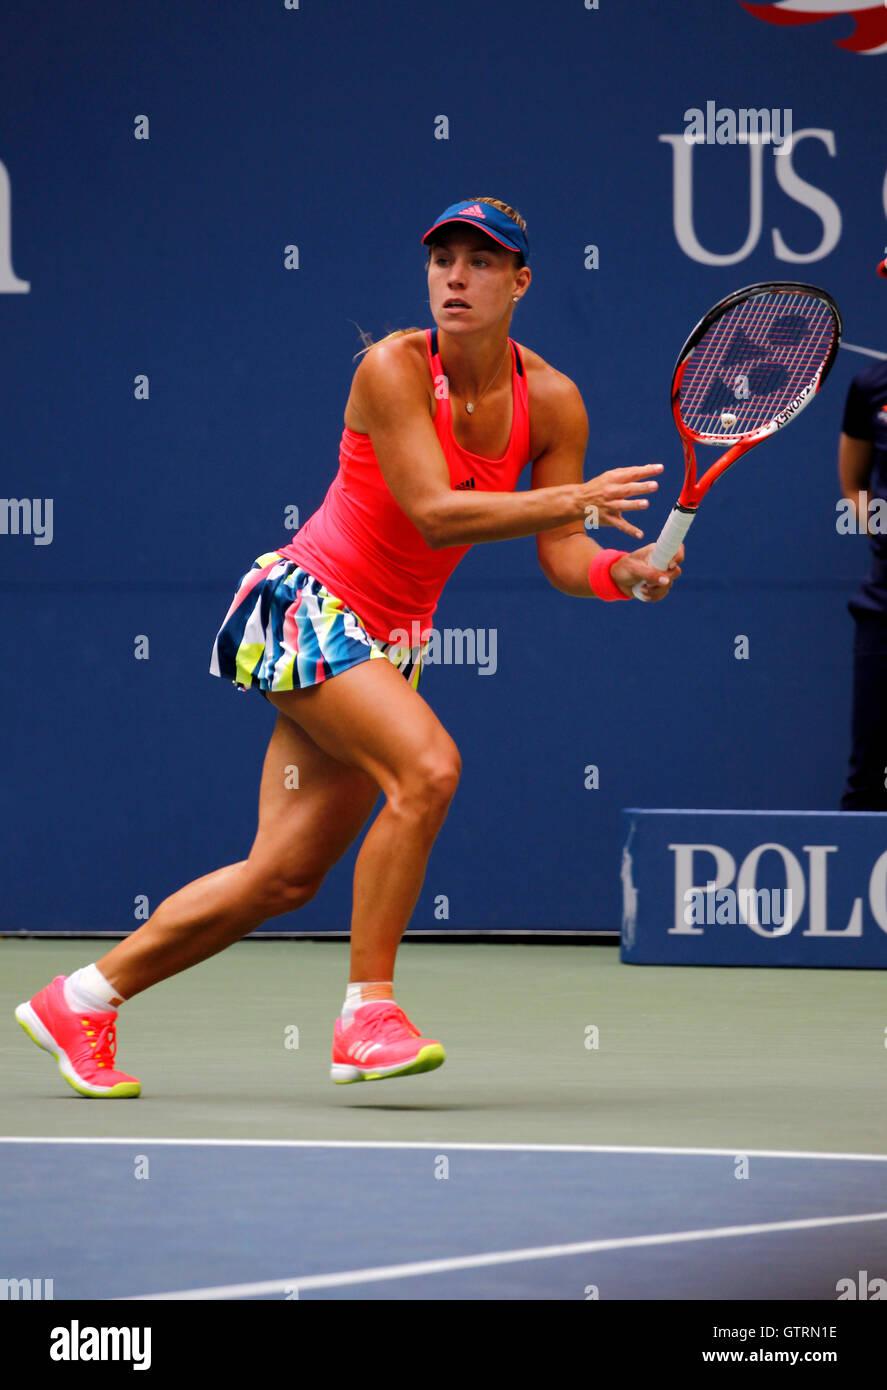 New York, USA. 10th September, 2016. Number 2 seed, Angelique Kerber of Germany in action against Karolina Pliskova - Stock Image